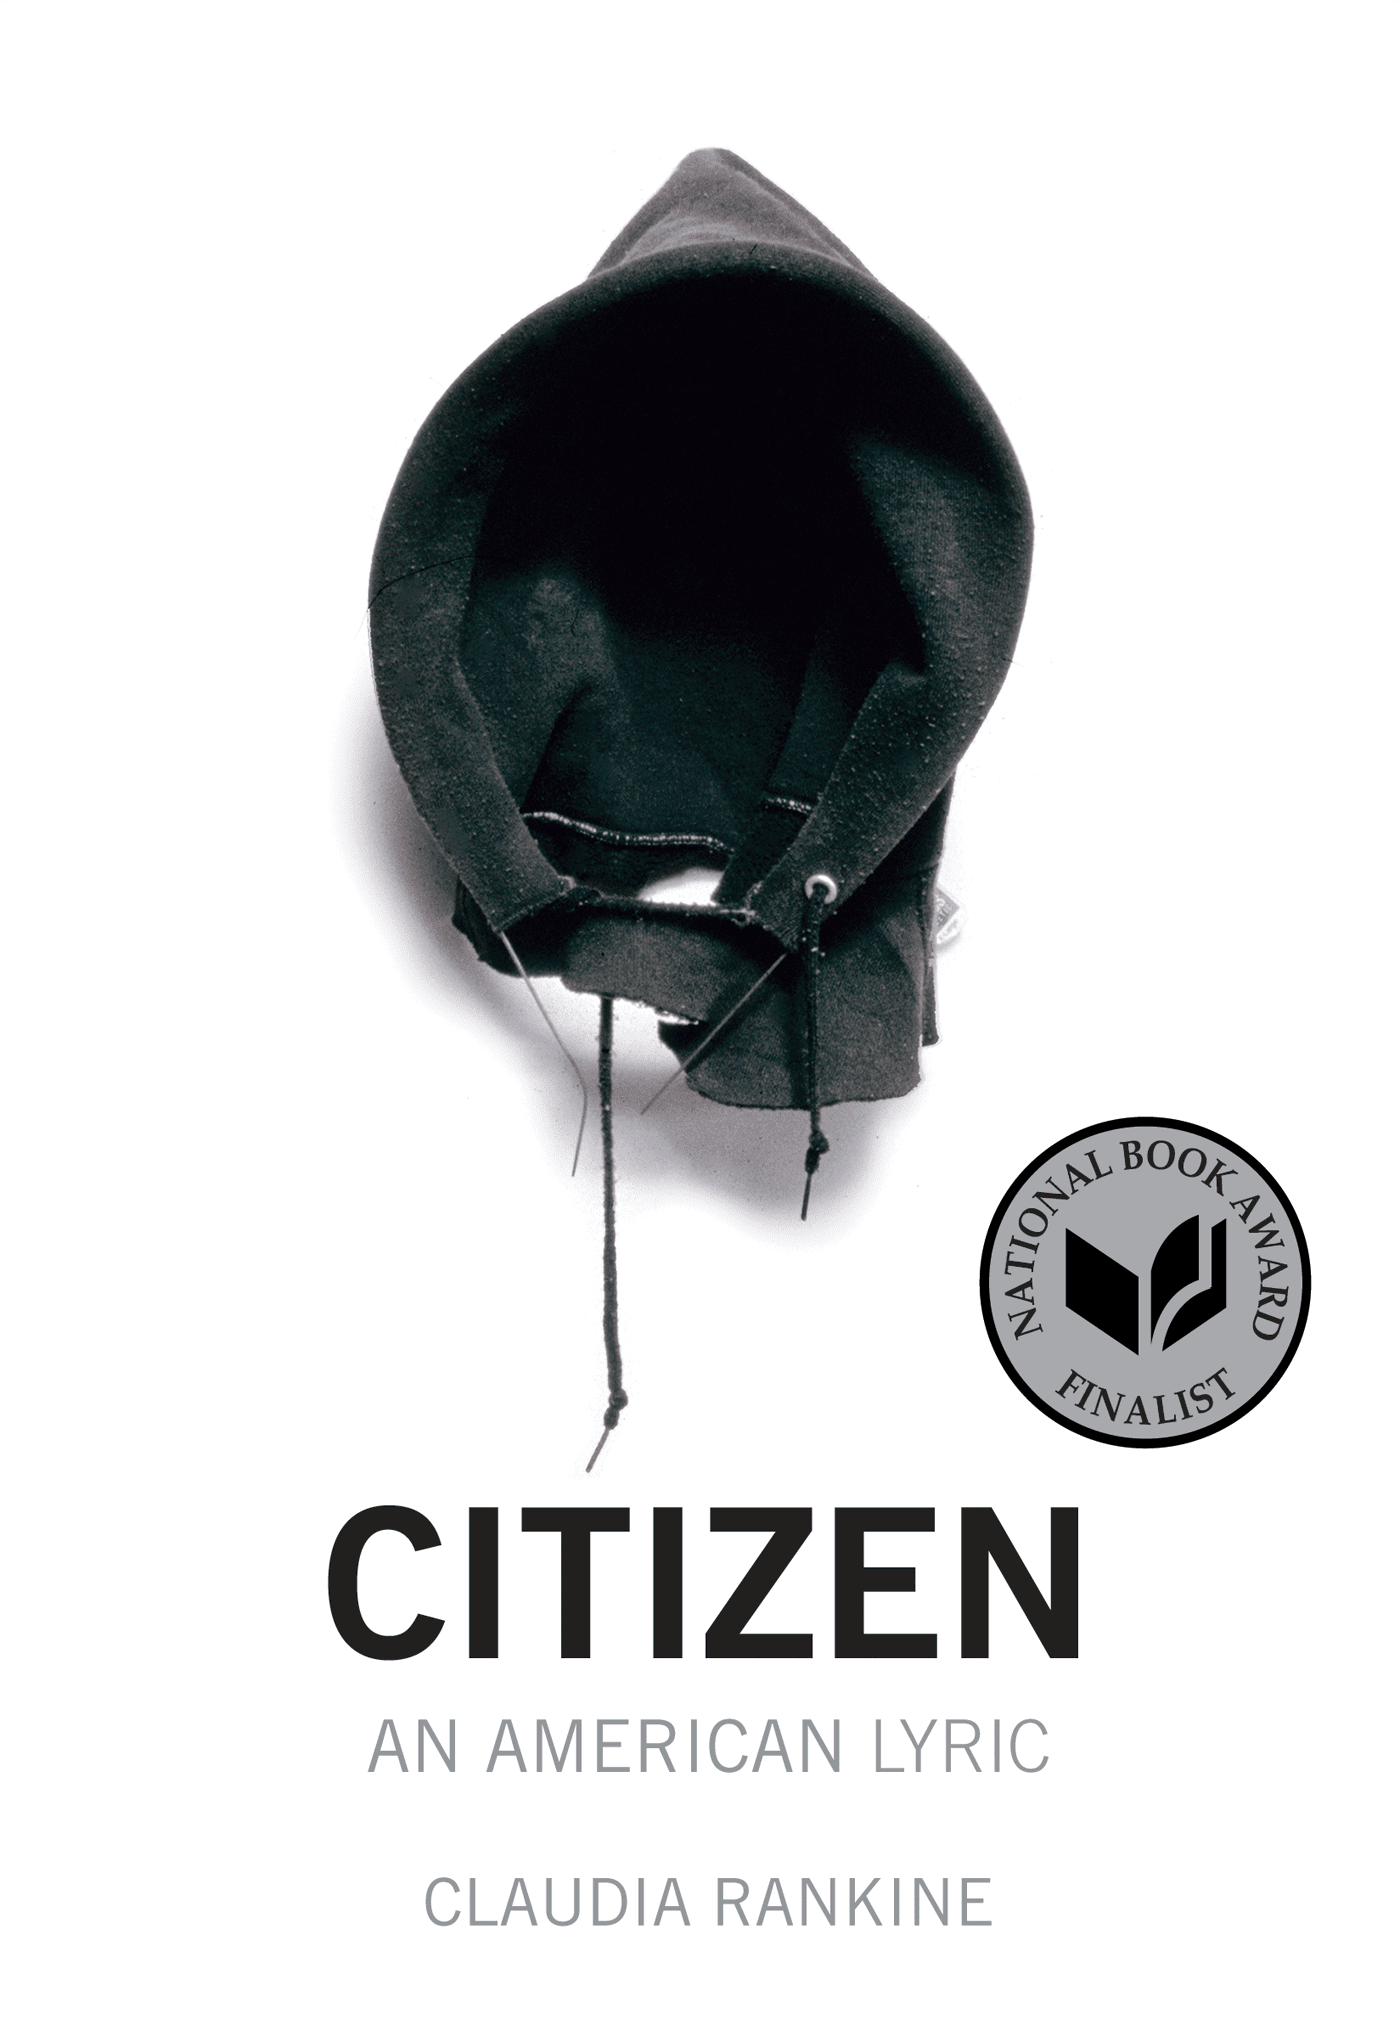 Citizen book cover image